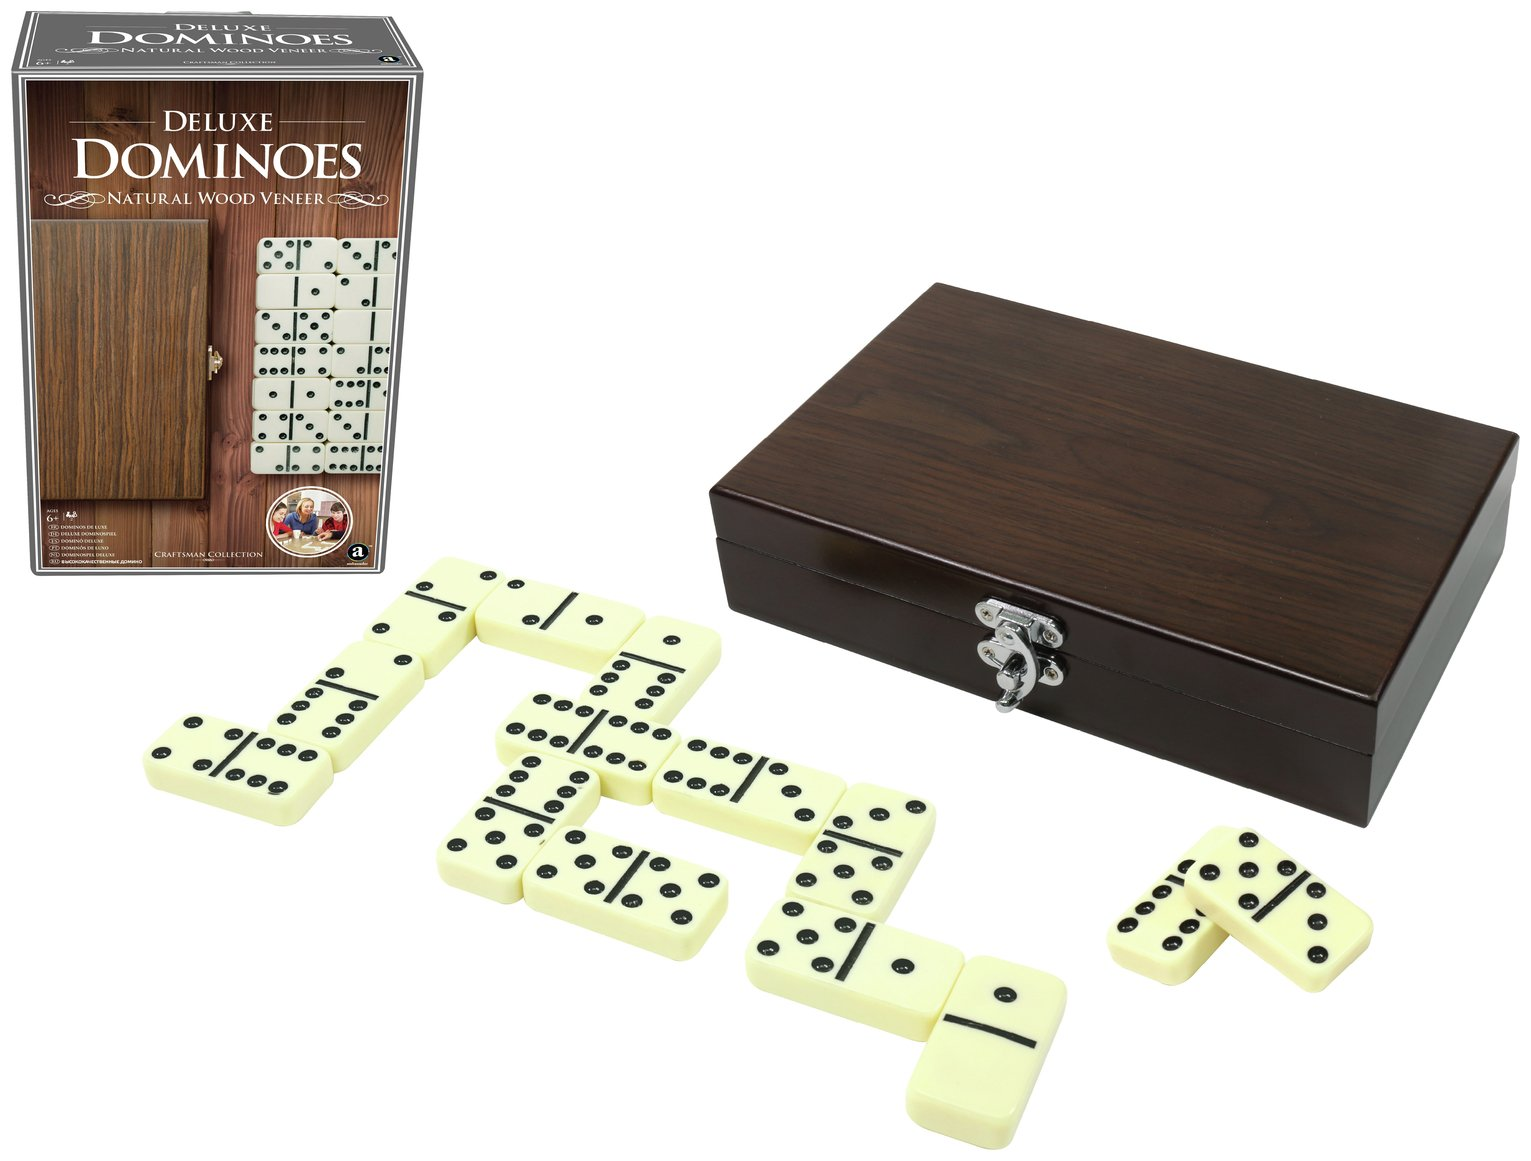 Craftsman Wood Veneer Deluxe Dominoes